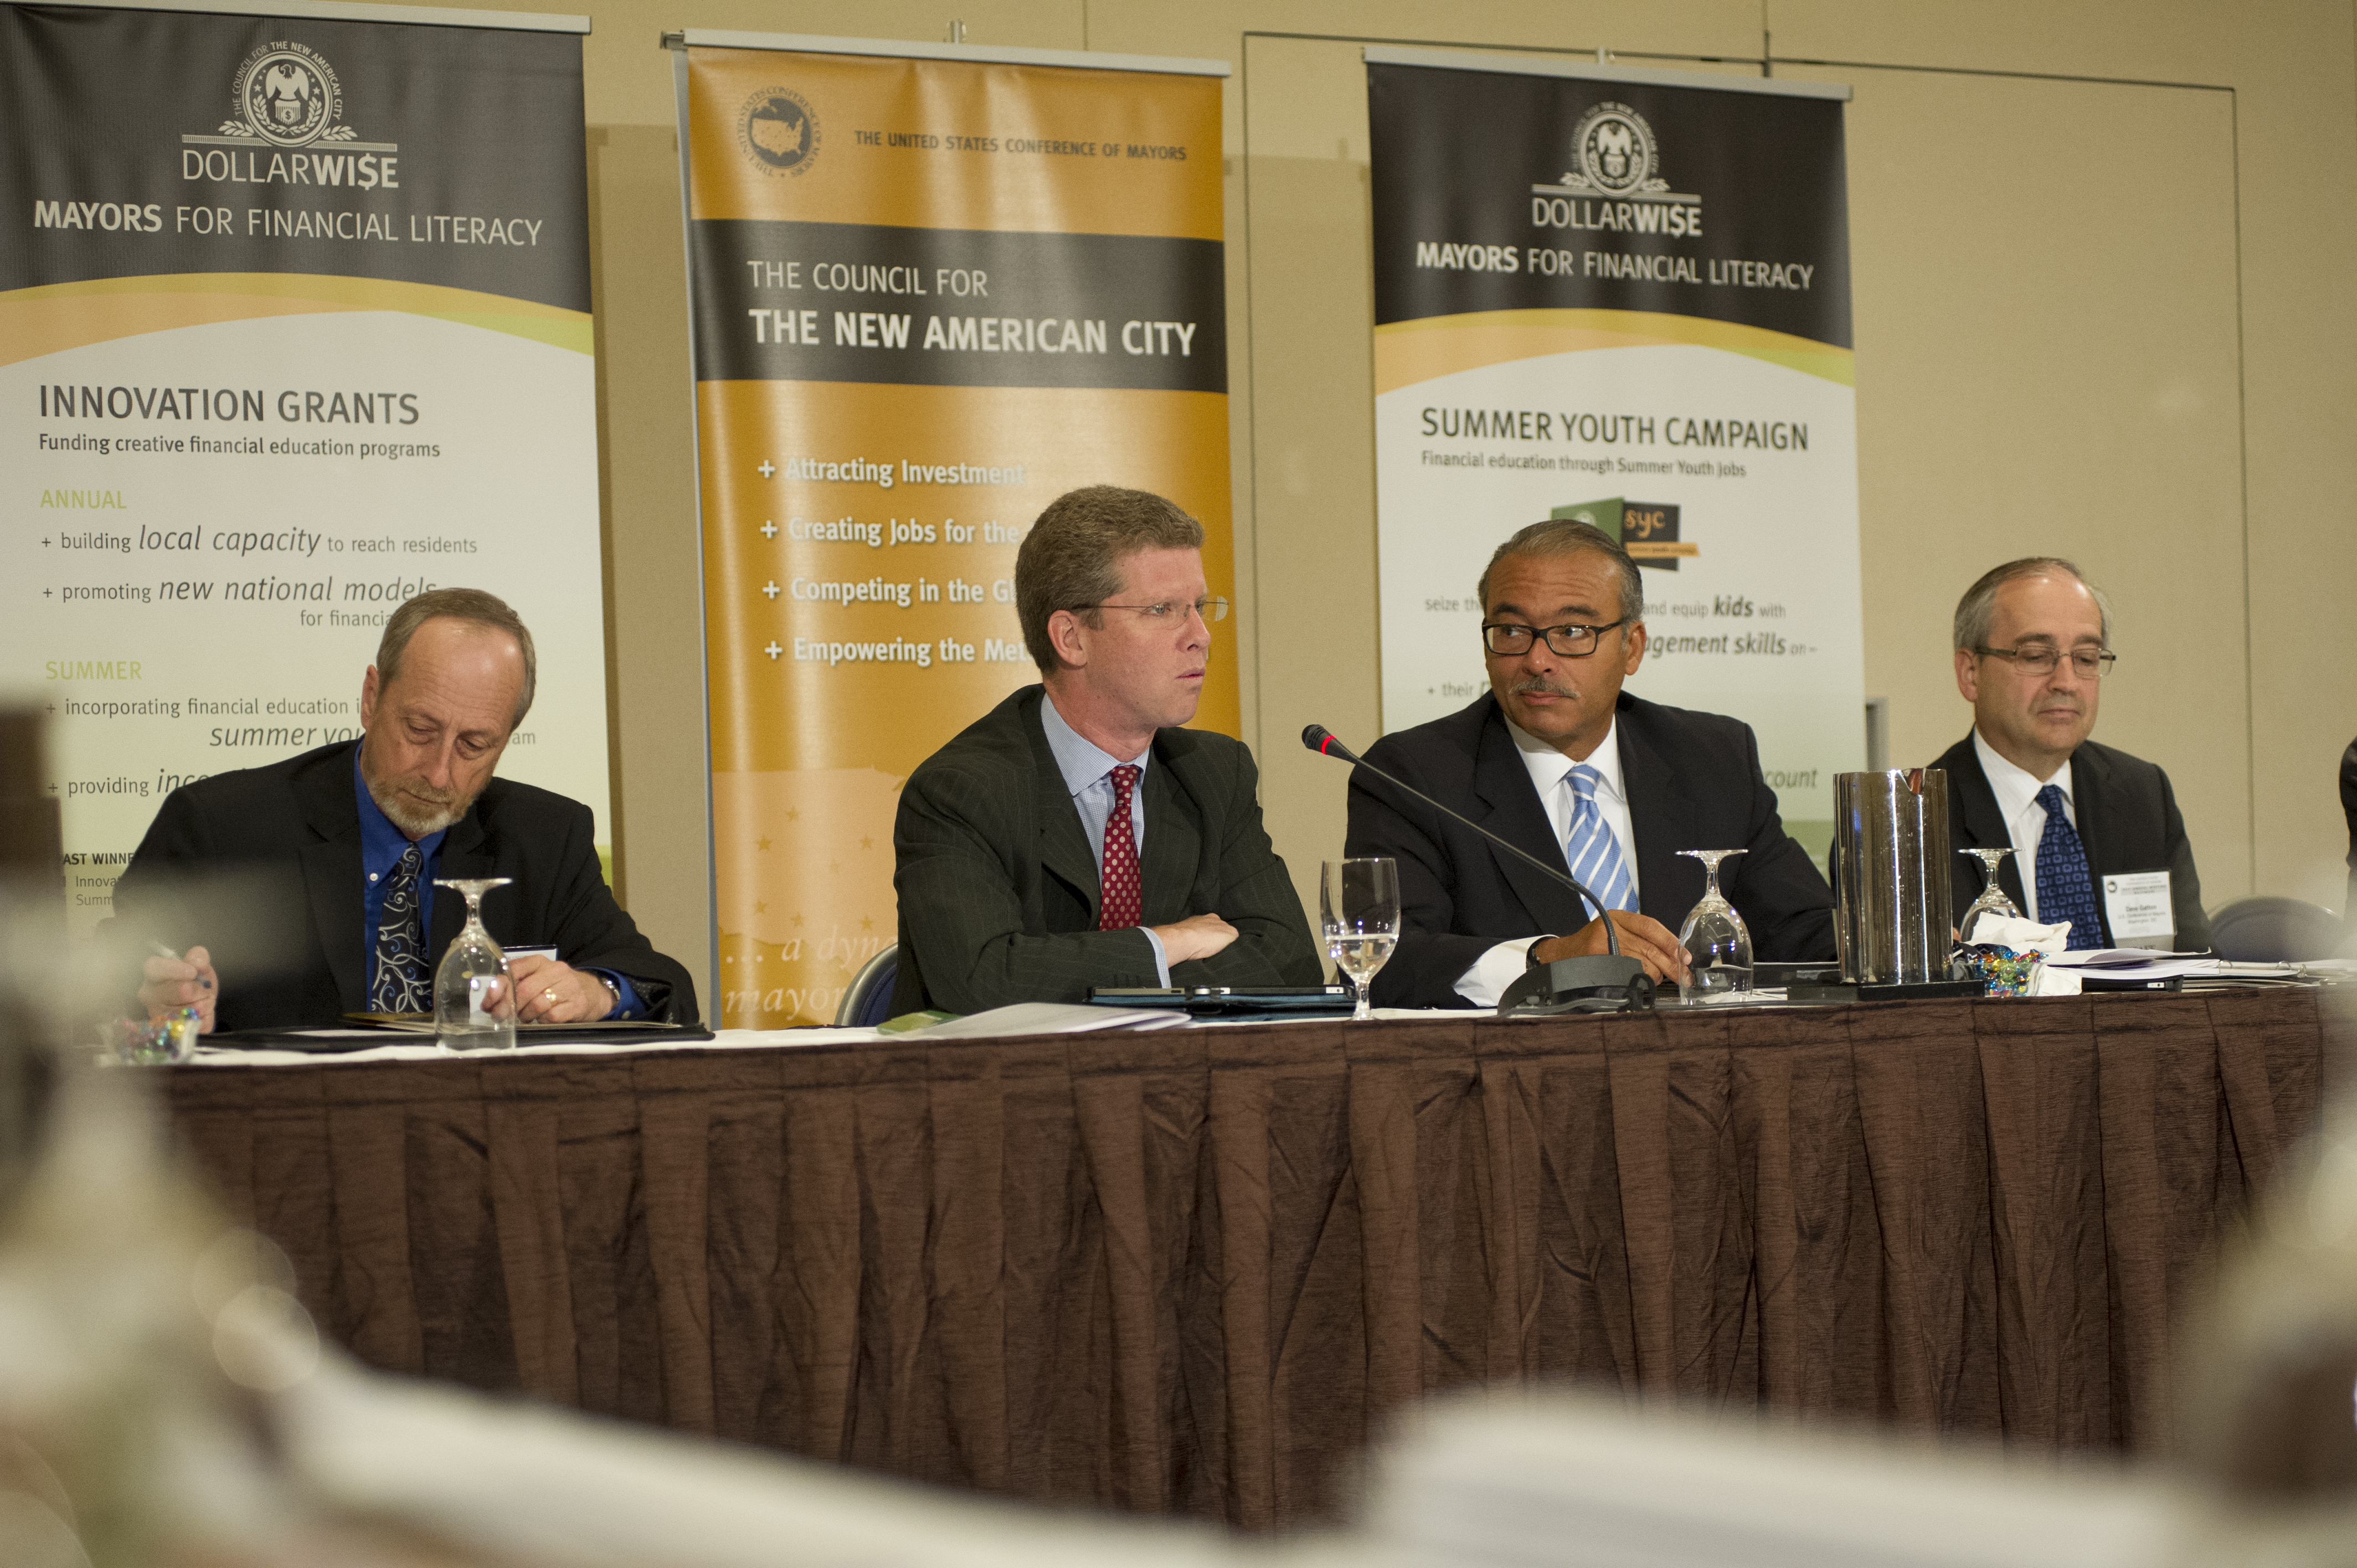 Secretary Shaun Donovan at U.S. Conference of Mayors meeting in Baltimore, Maryland